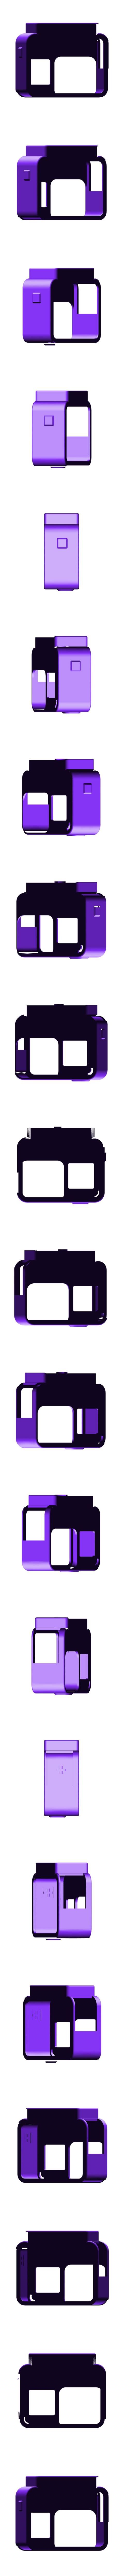 GP5Flex.stl Download free STL file GoPro Hero 5 Flexible Case • 3D printing object, Adafruit